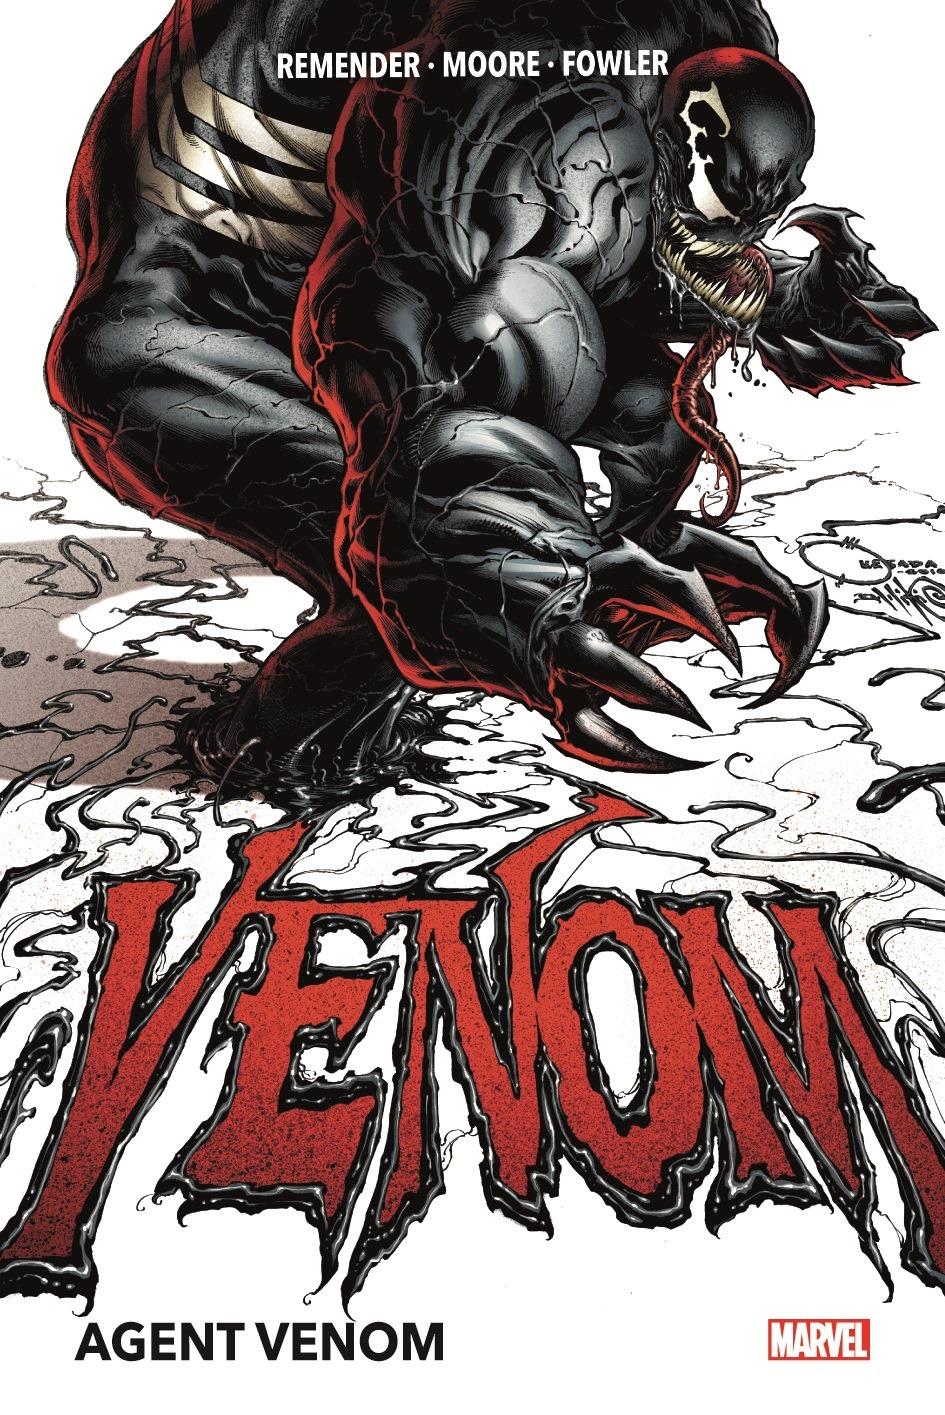 VENOM 1 : Agent Venom